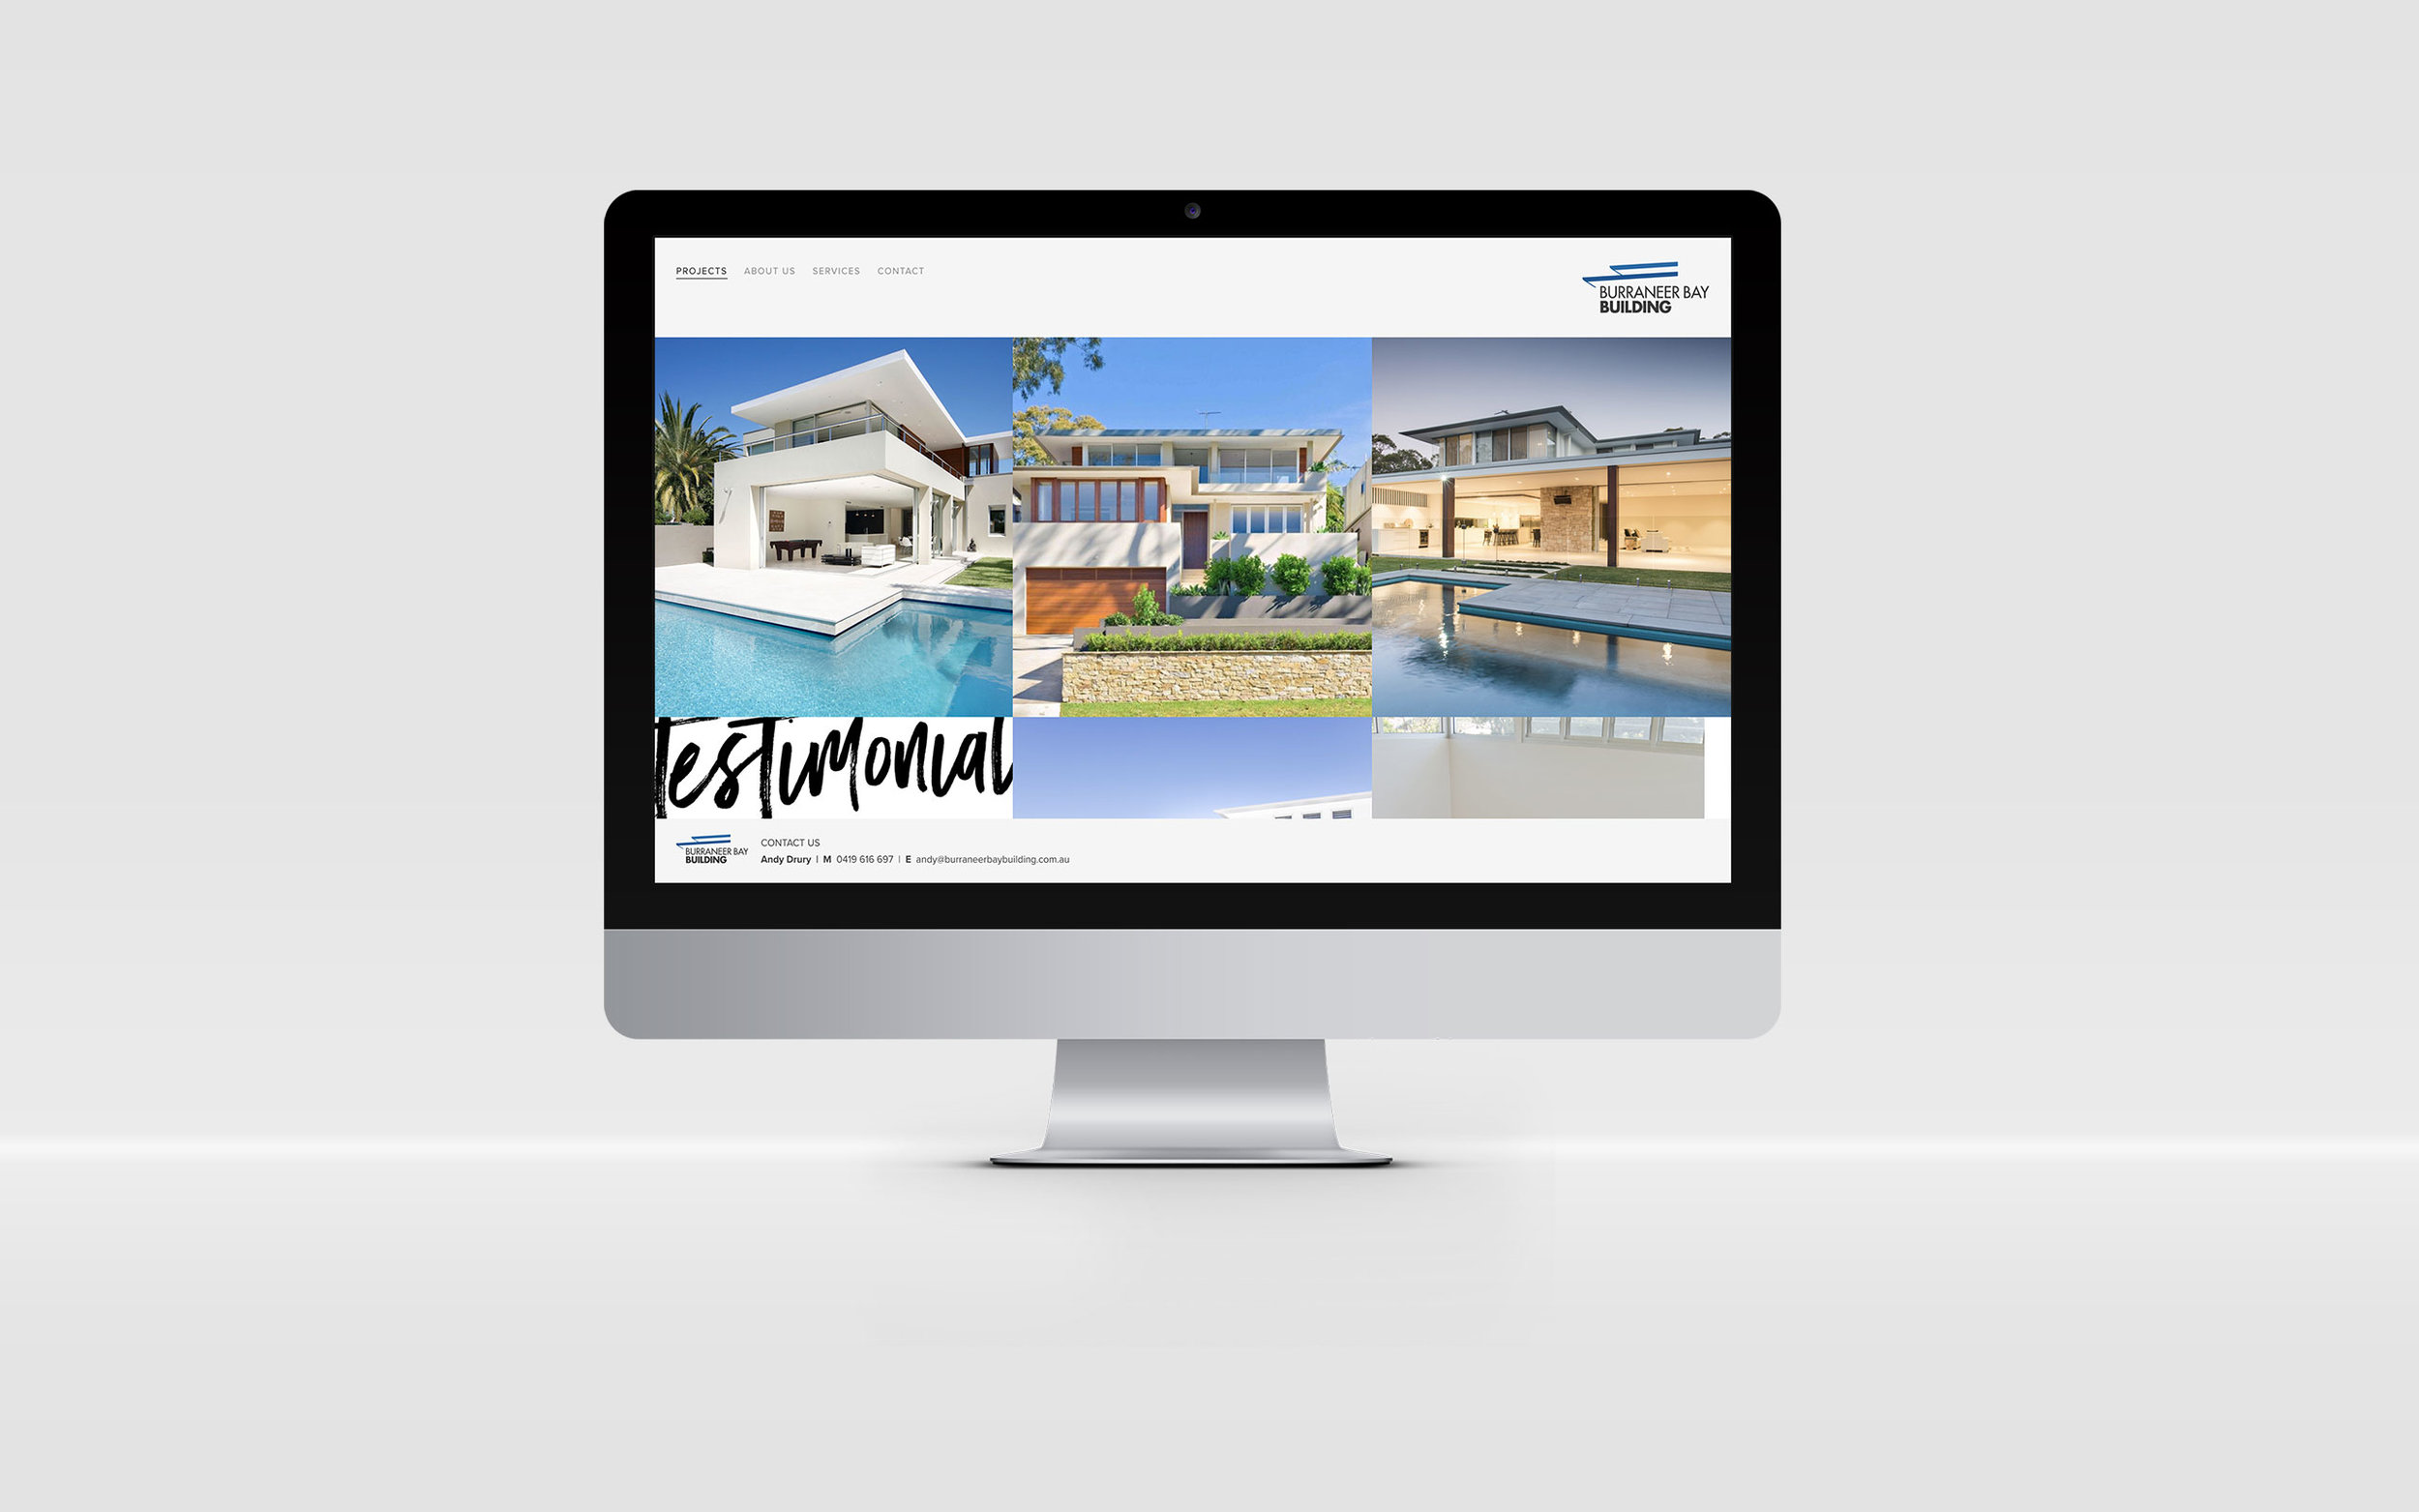 Burraneer-Bay-Building-Website-Copywriting-1.jpg